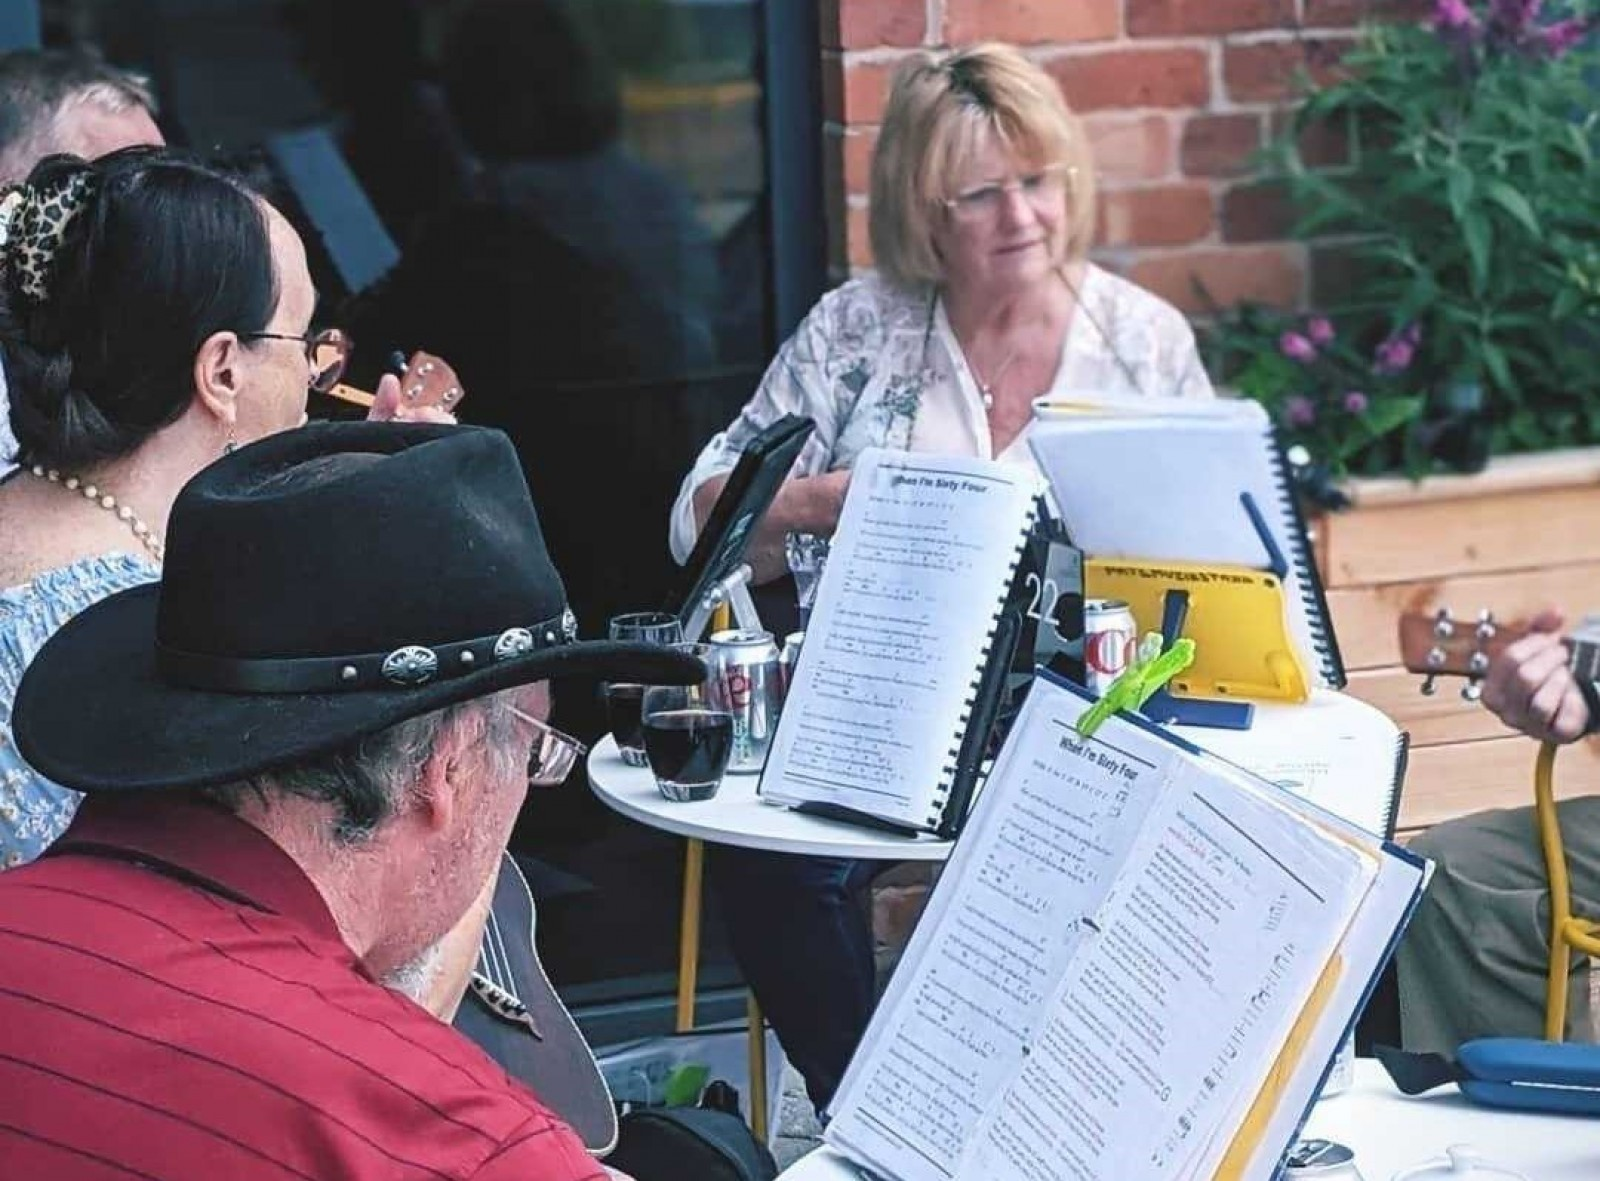 A Ukele Orchestra plays outside the Hub CafeBar